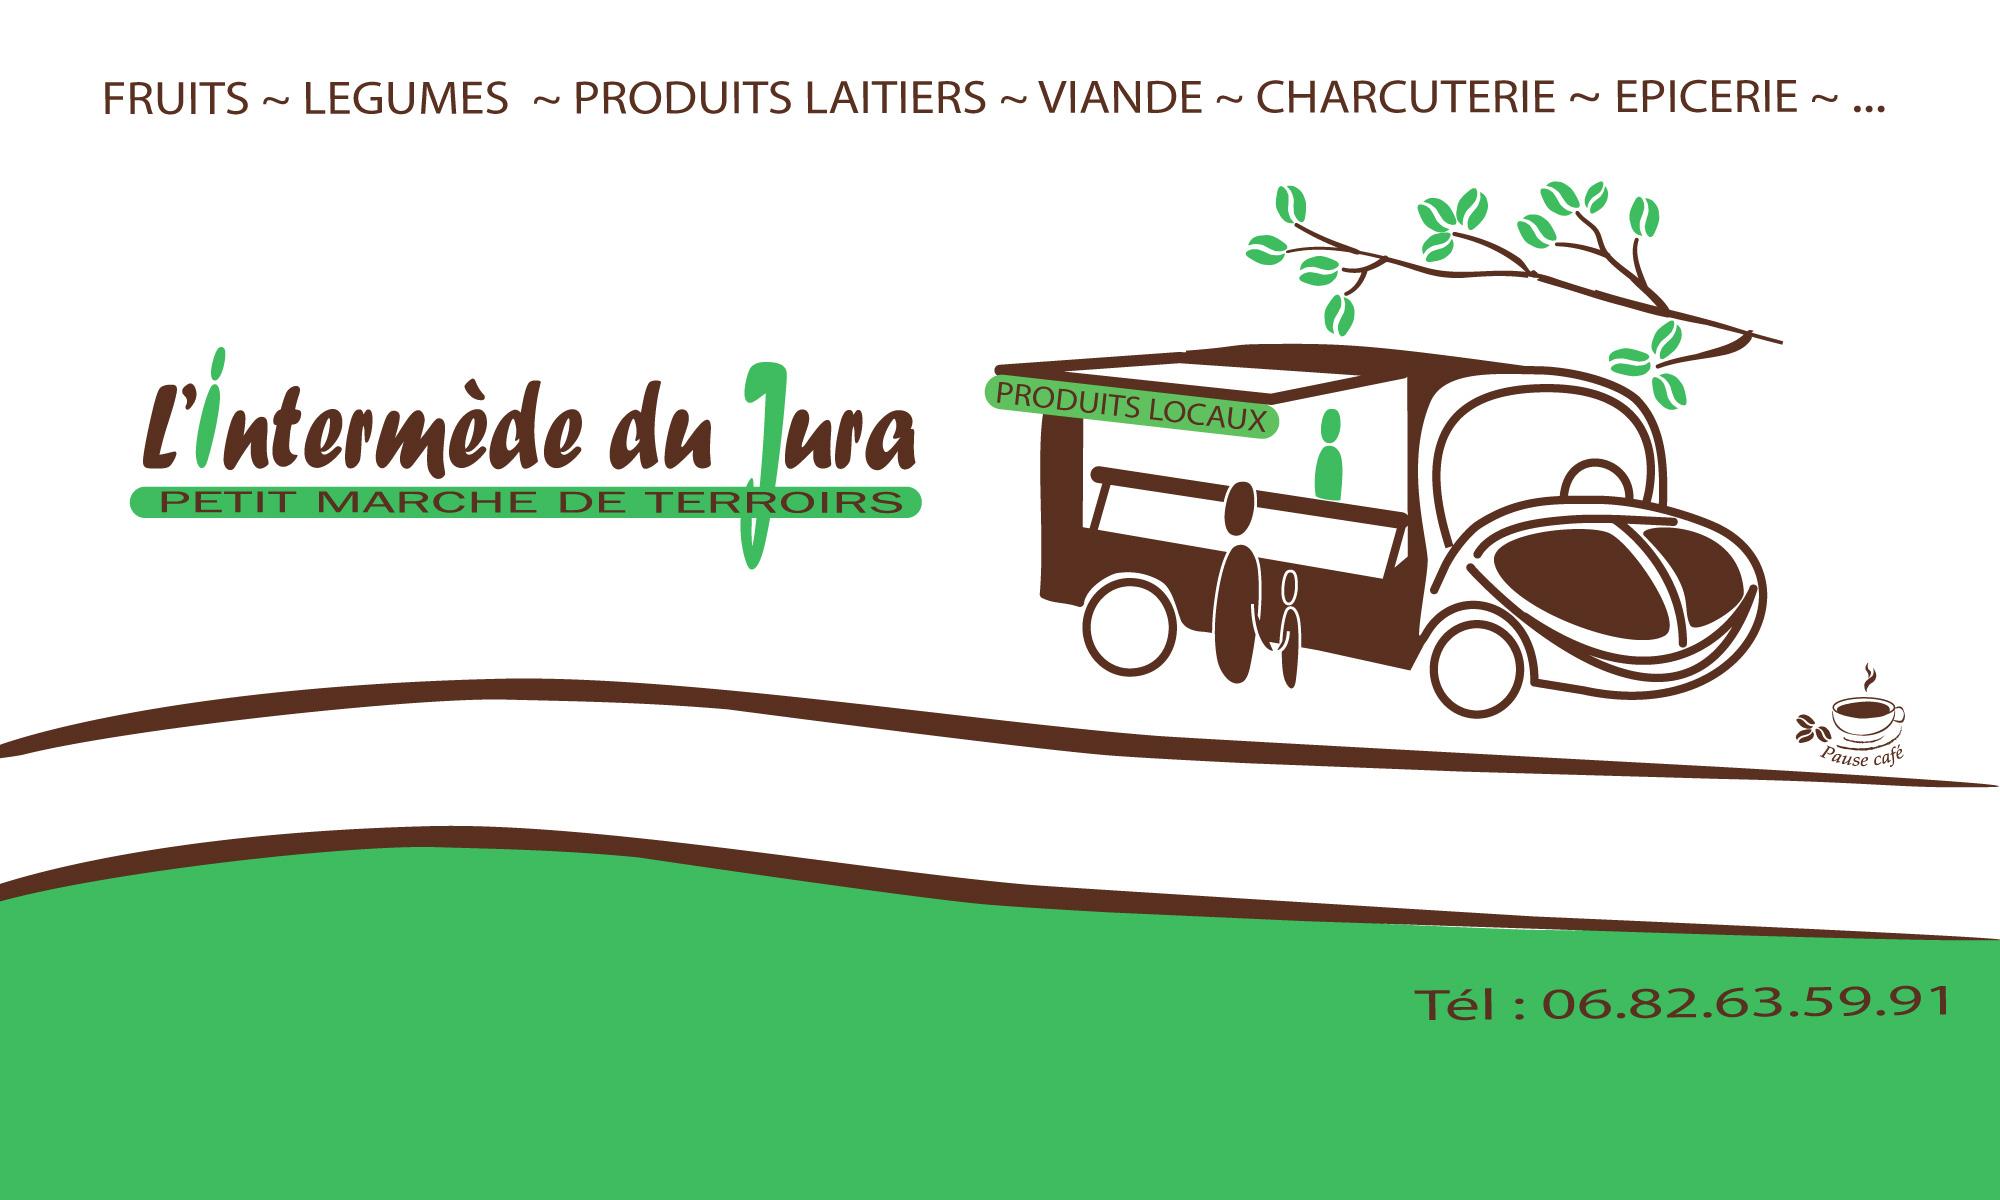 Épicerie mobile, l'Intermède du Jura